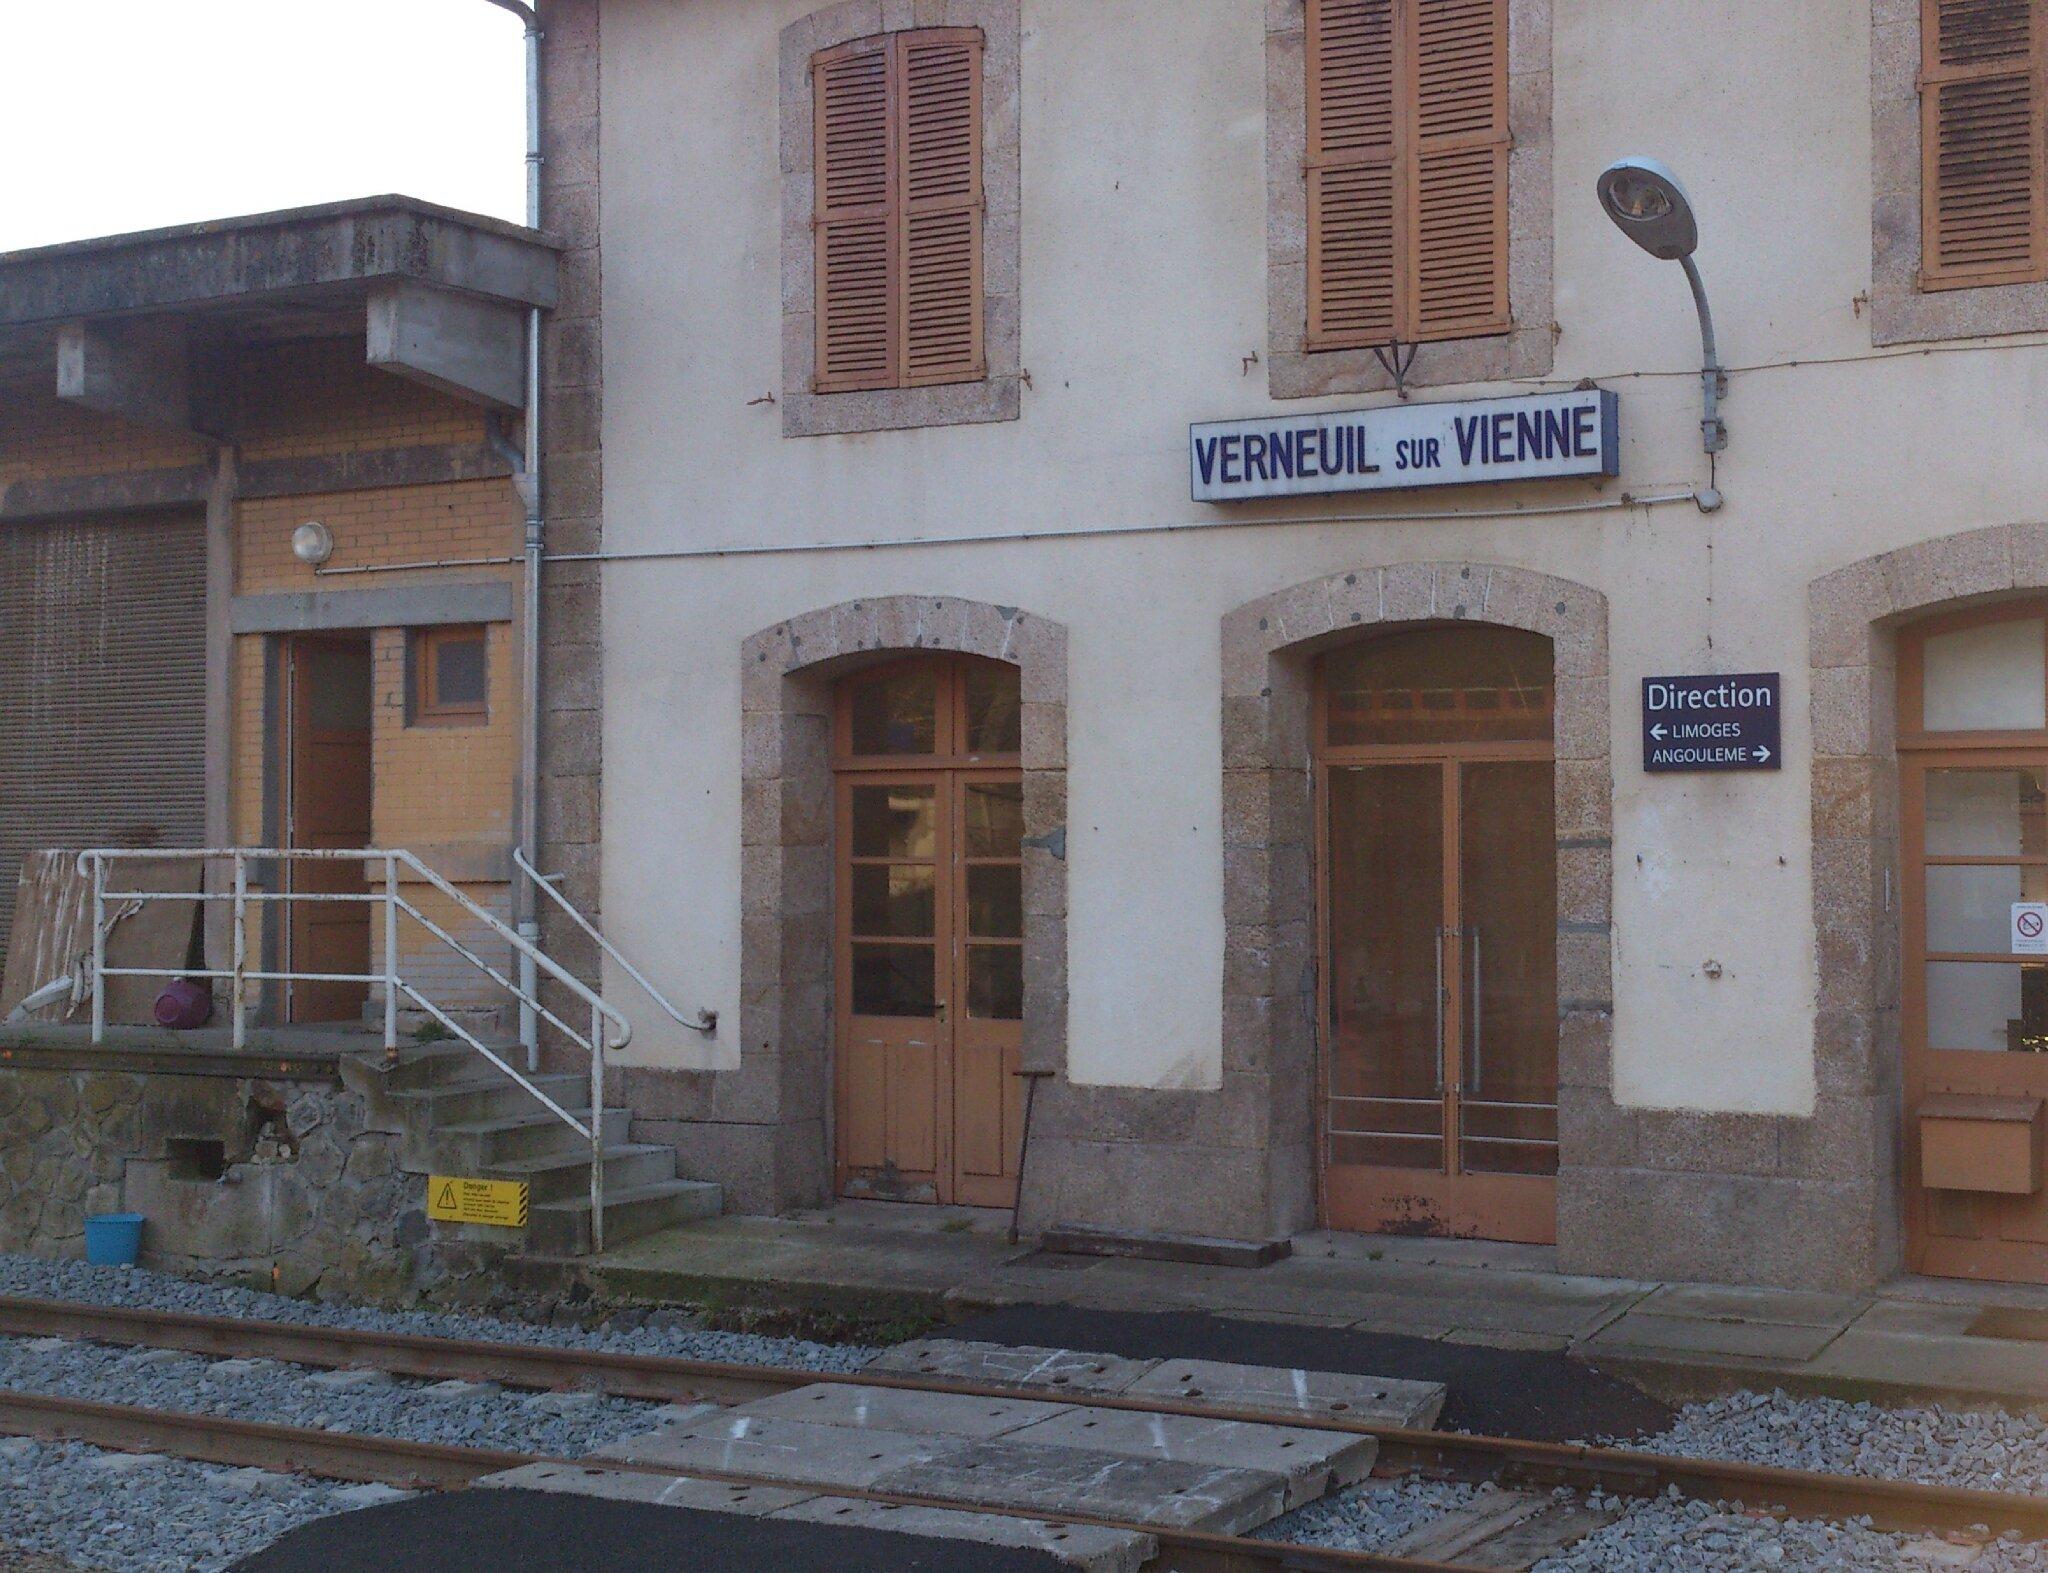 Verneuil-sur-Vienne (Haute-Vienne)